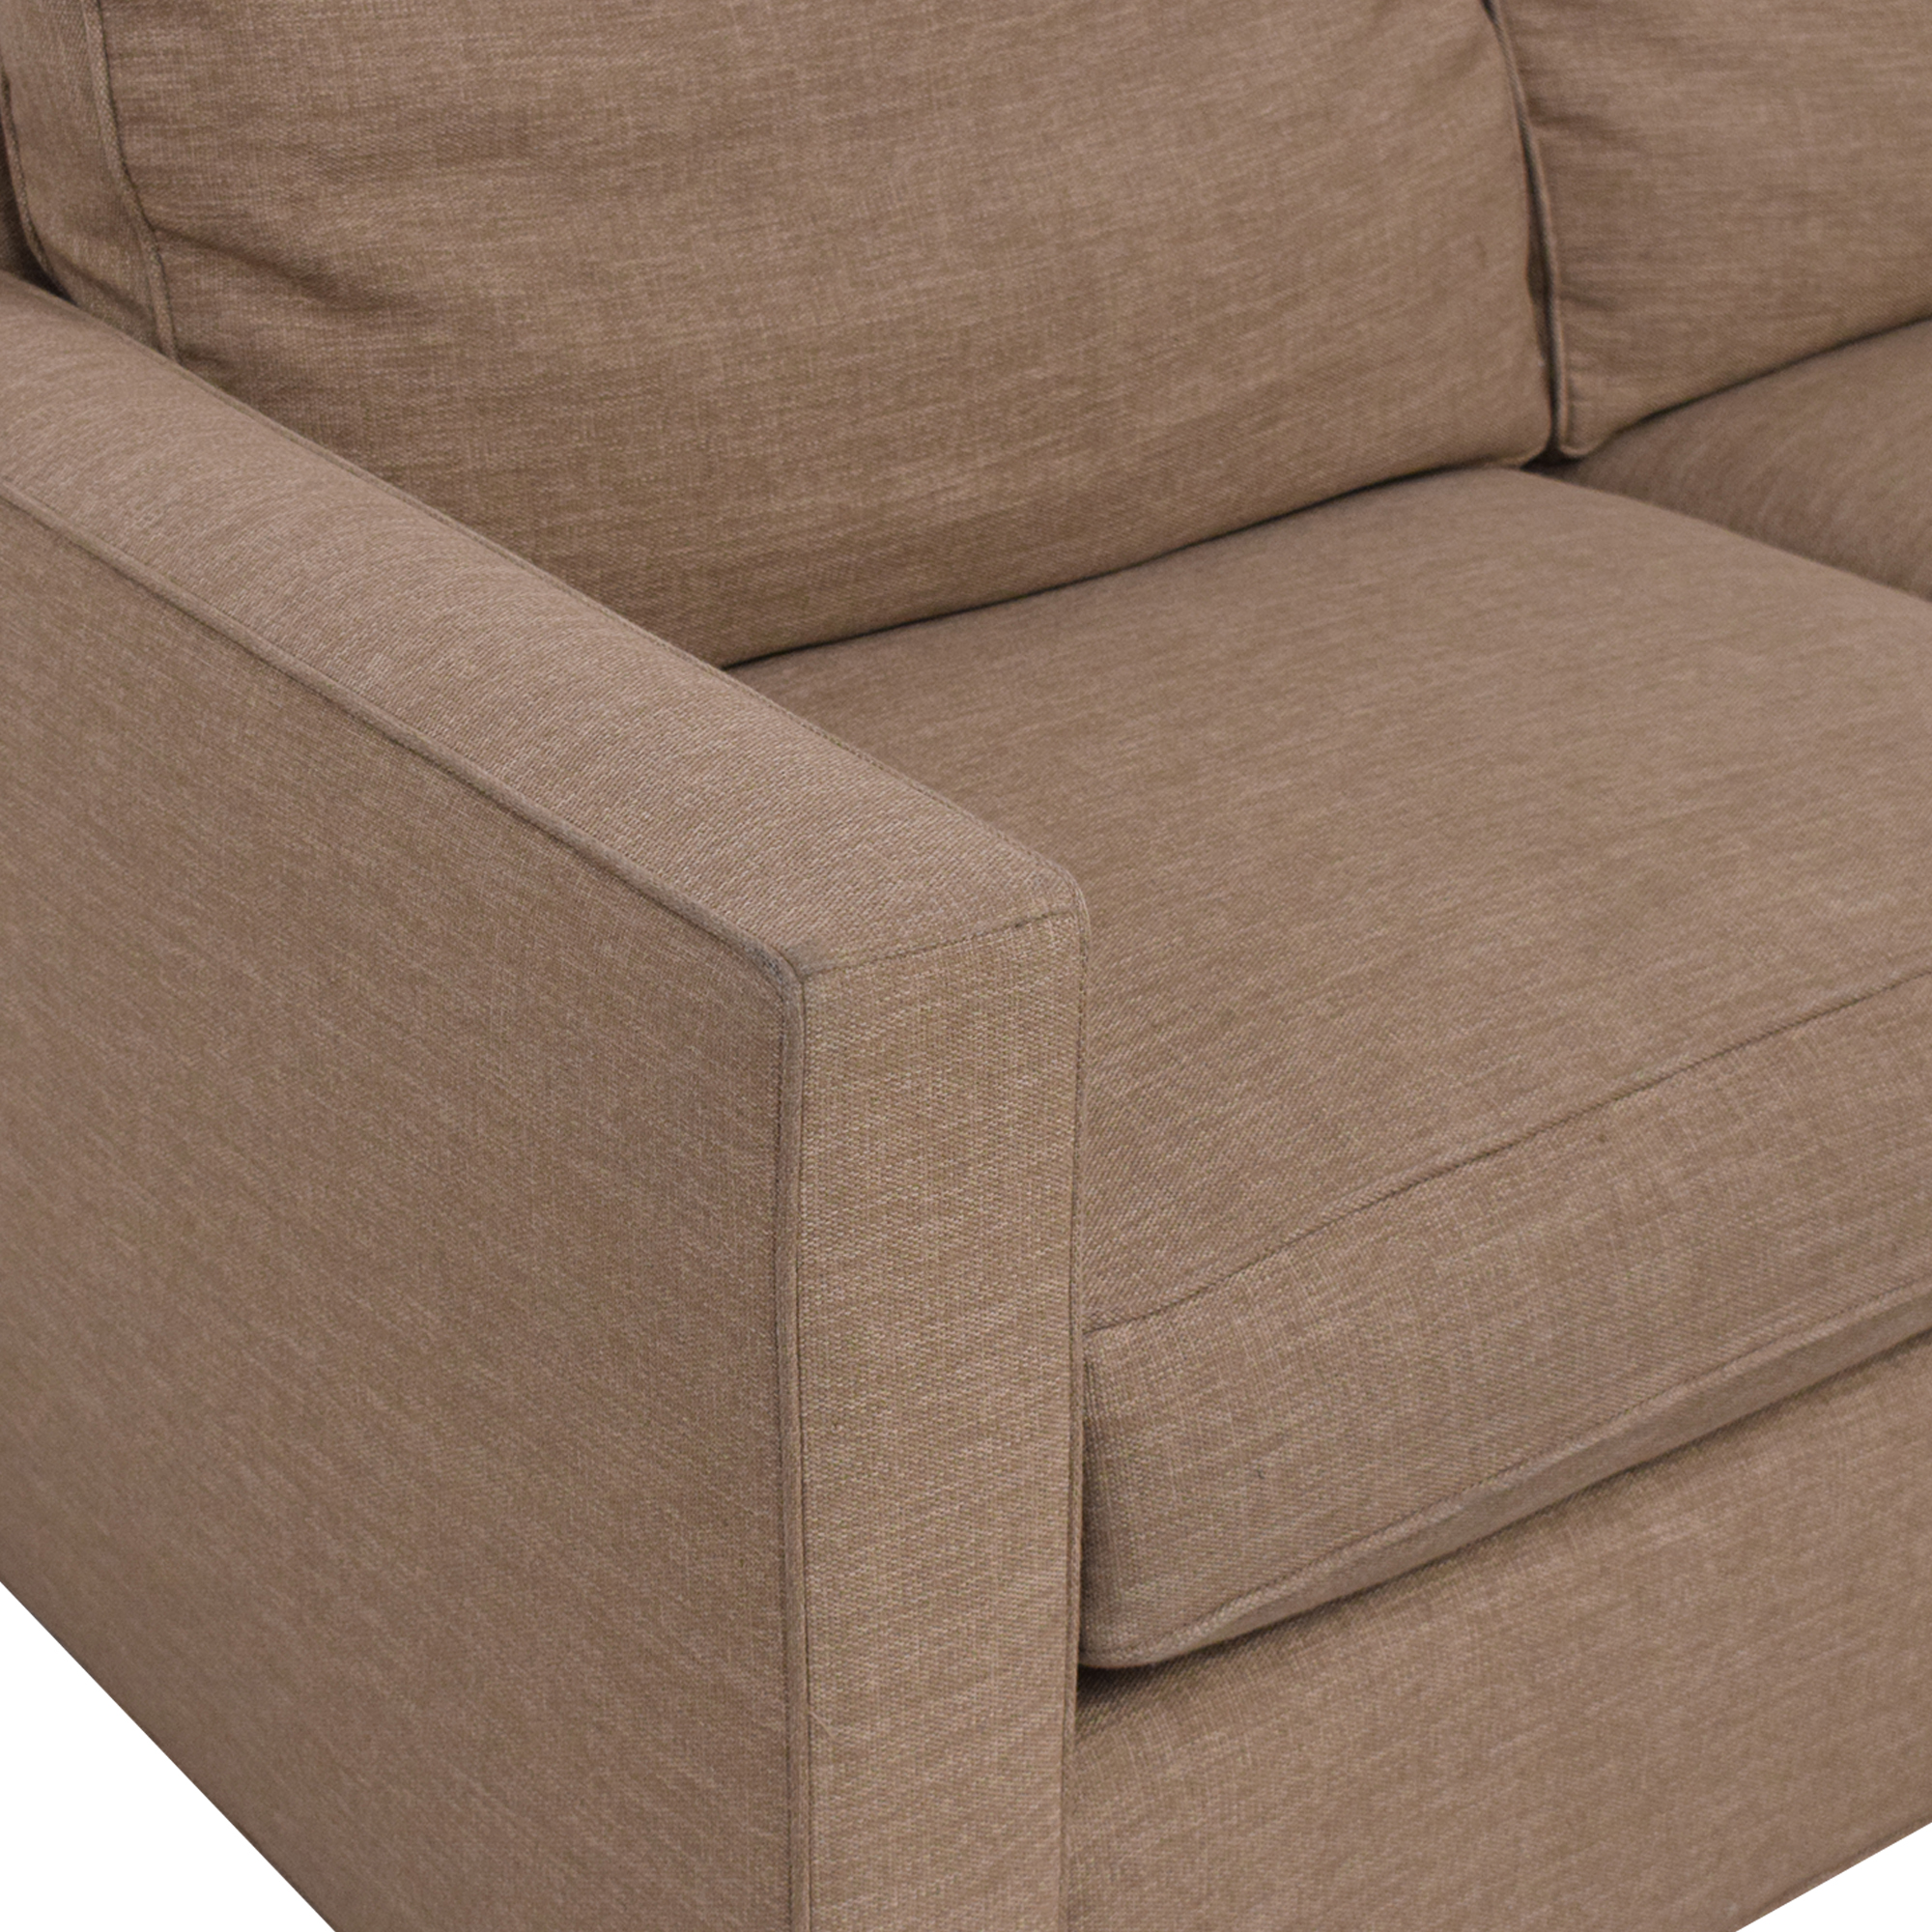 Crate & Barrel Davis Sectional Sofa / Sectionals